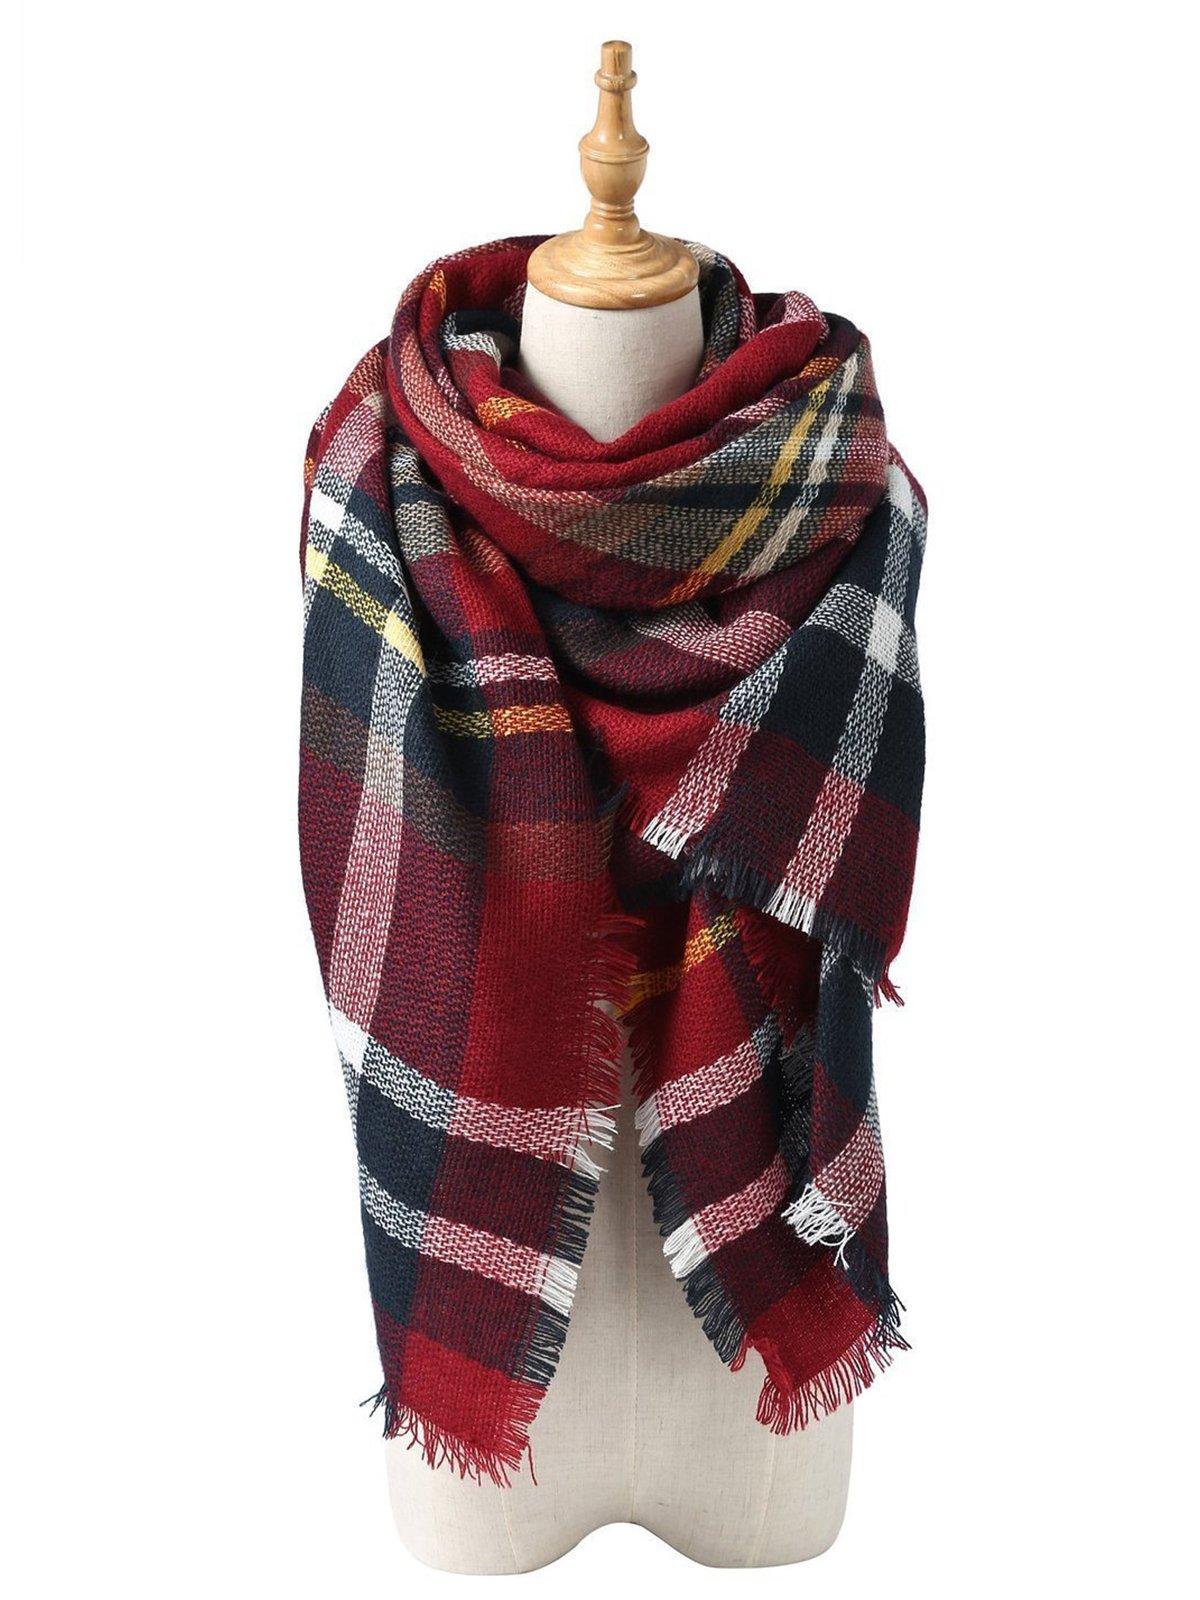 Zando Women's Scarves Plaid Blanket Thick Fall Winter Scarf Dark Red